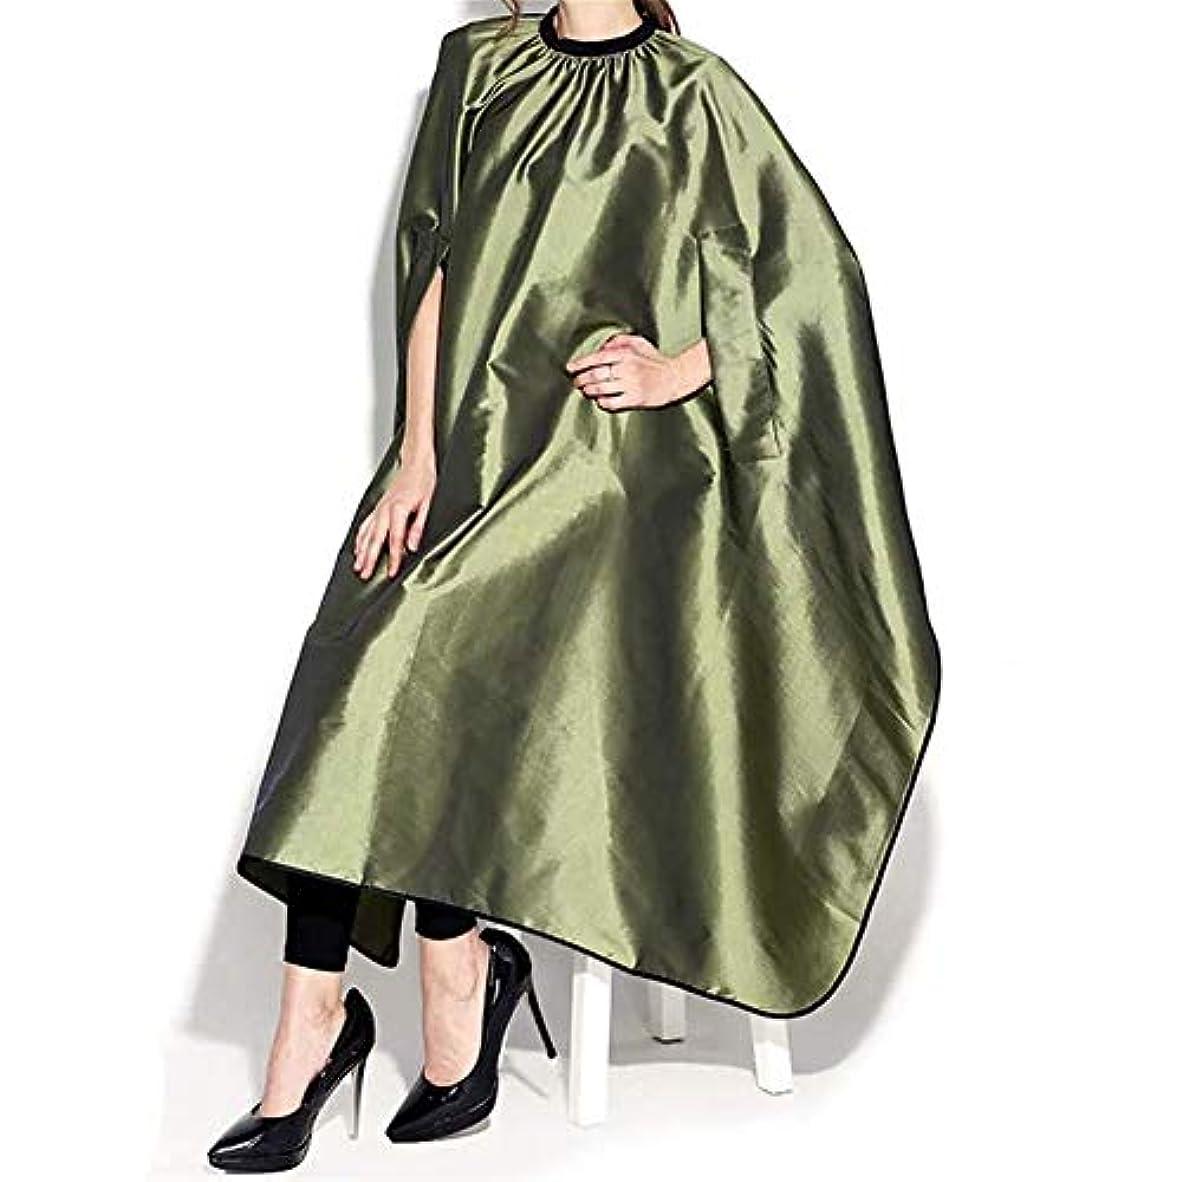 HIZLJJ 理髪理髪ガウン防水サロンケープ散髪エプロン髪カット染めスタイリング布 (Color : Green)